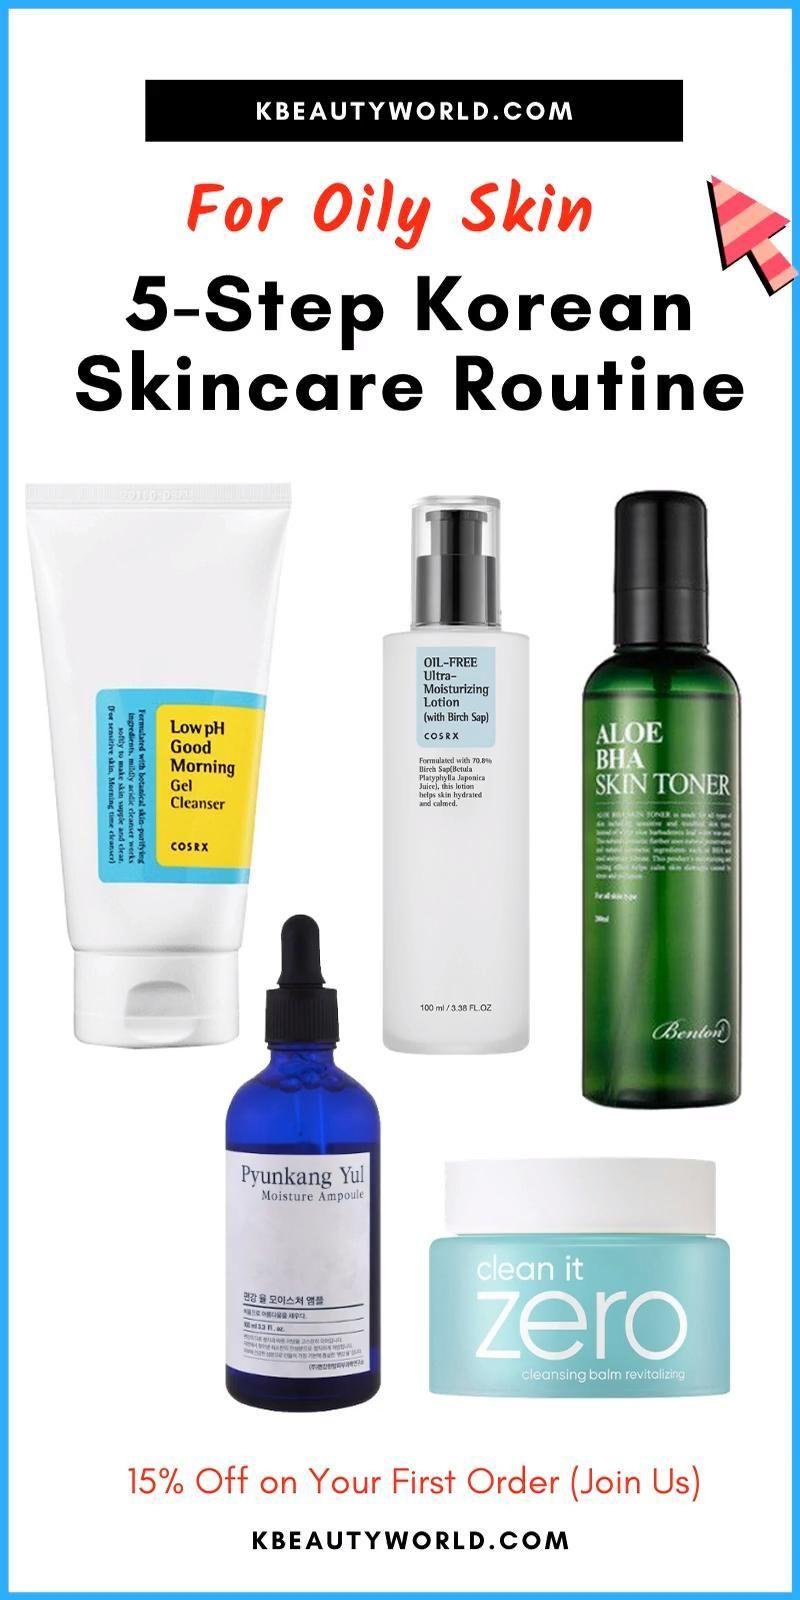 Skincare Routine For Combination Skin Face Skin Care Routine Oily Skin Care Routine Skincare For Combination Skin